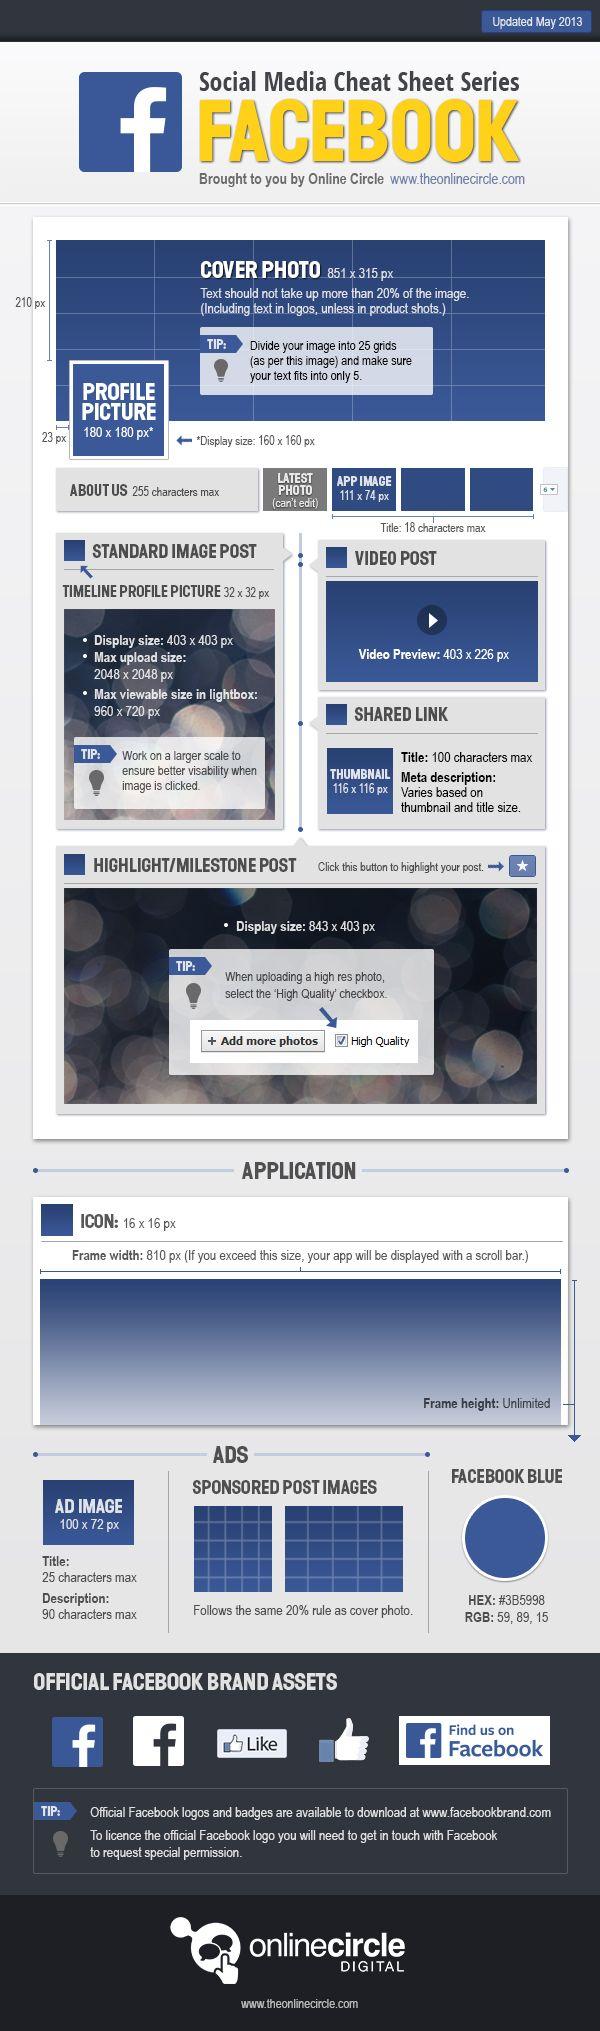 Facebook Cheat Sheet 2013: http://marketingeasy.net/wp-content/uploads/2013/05/OnlineCircle_Infographics_SocialMediaCheatSheets_Facebook_v6.jpg